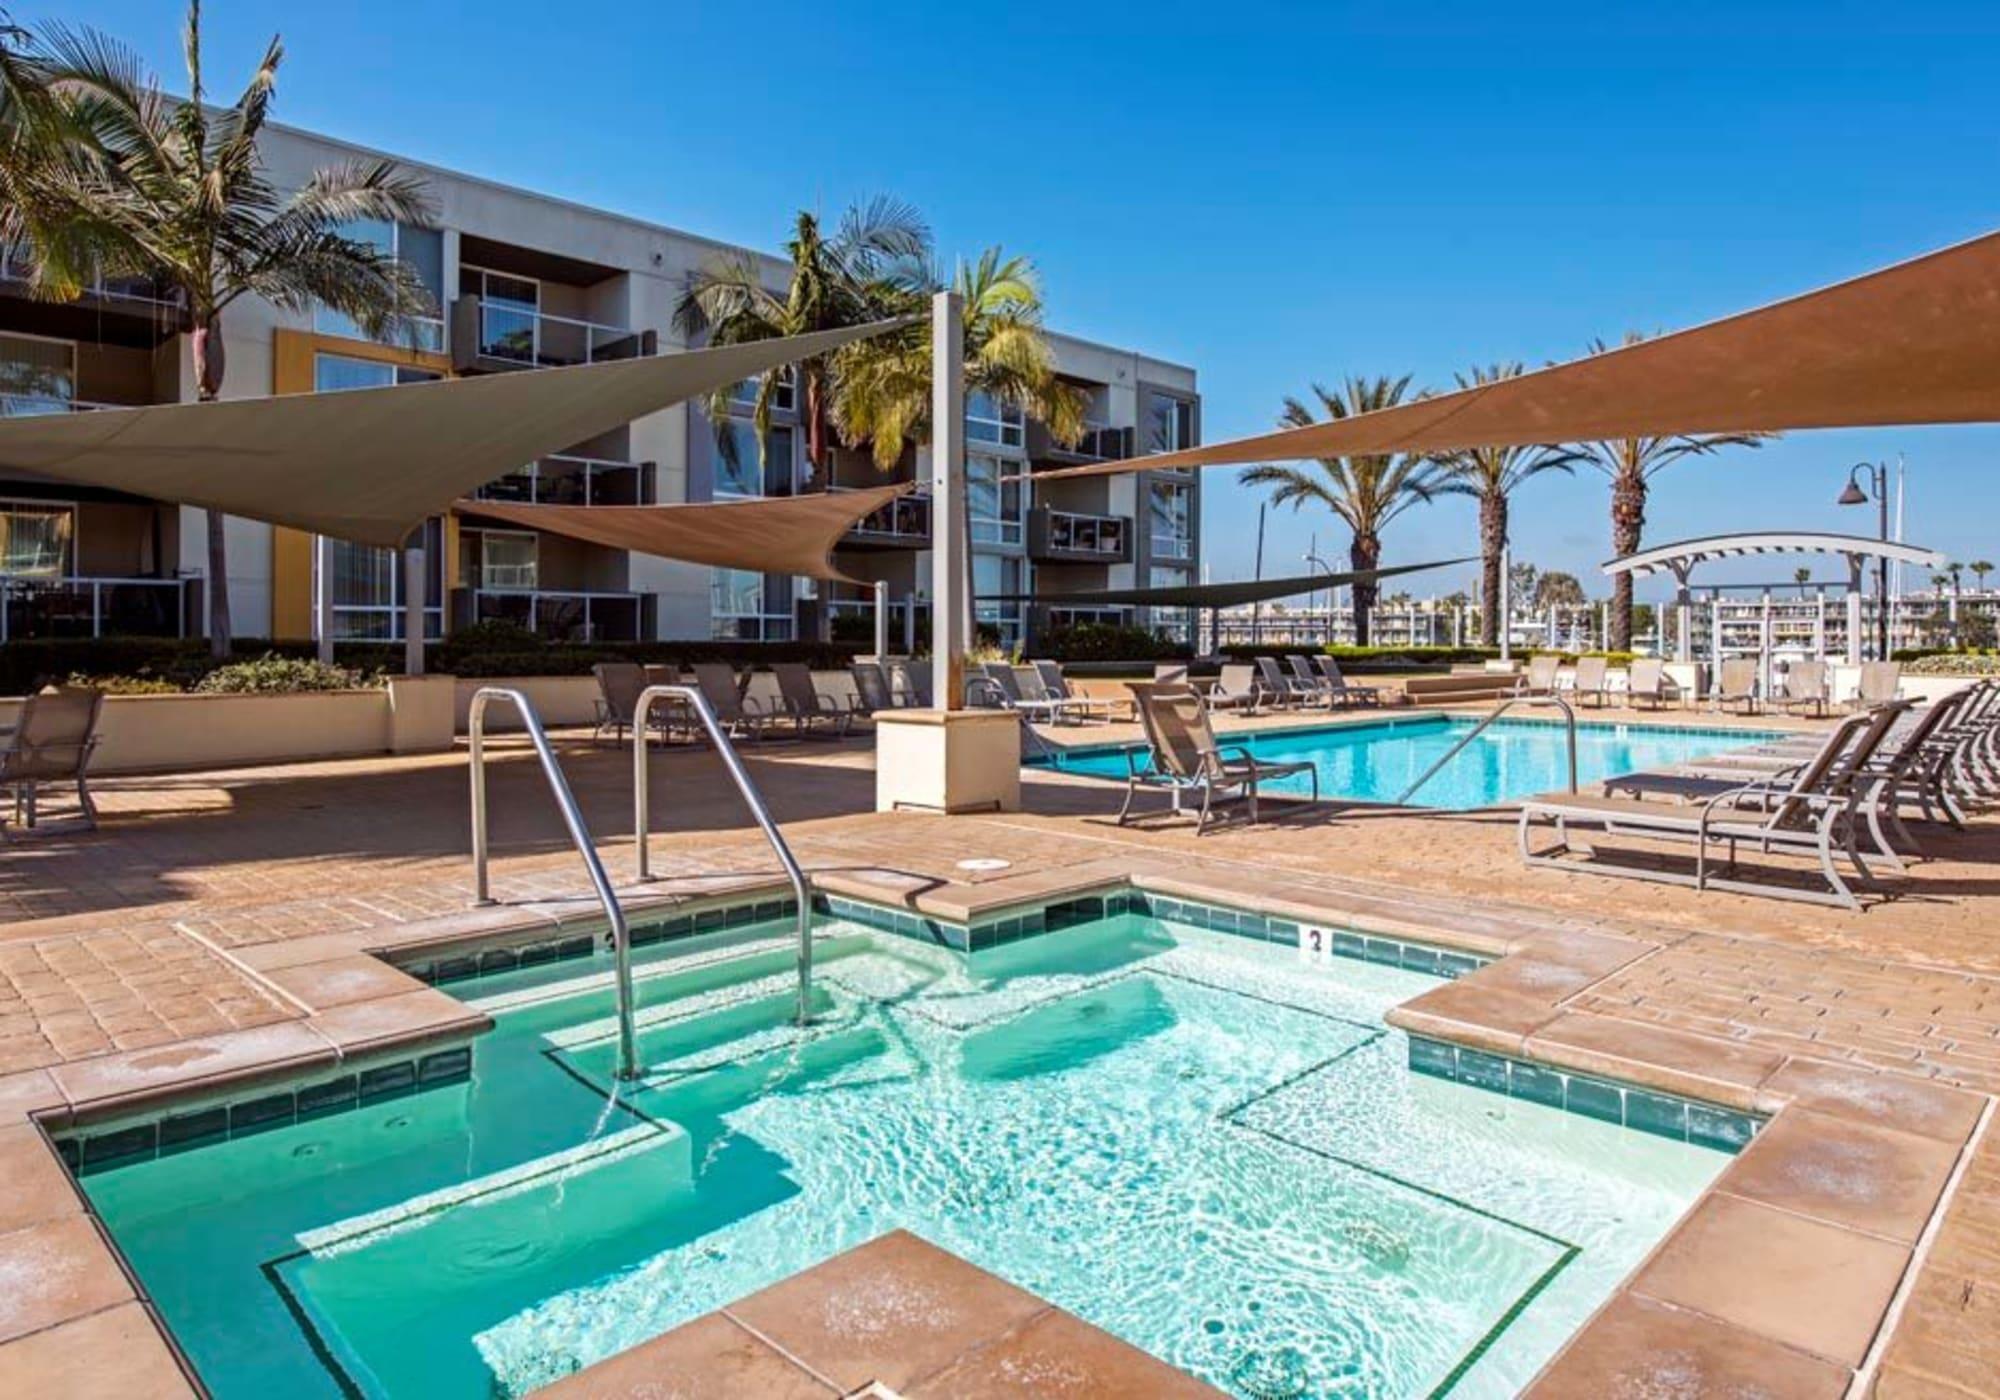 Luxurious spa near the swimming pool at The Villa at Marina Harbor in Marina del Rey, California